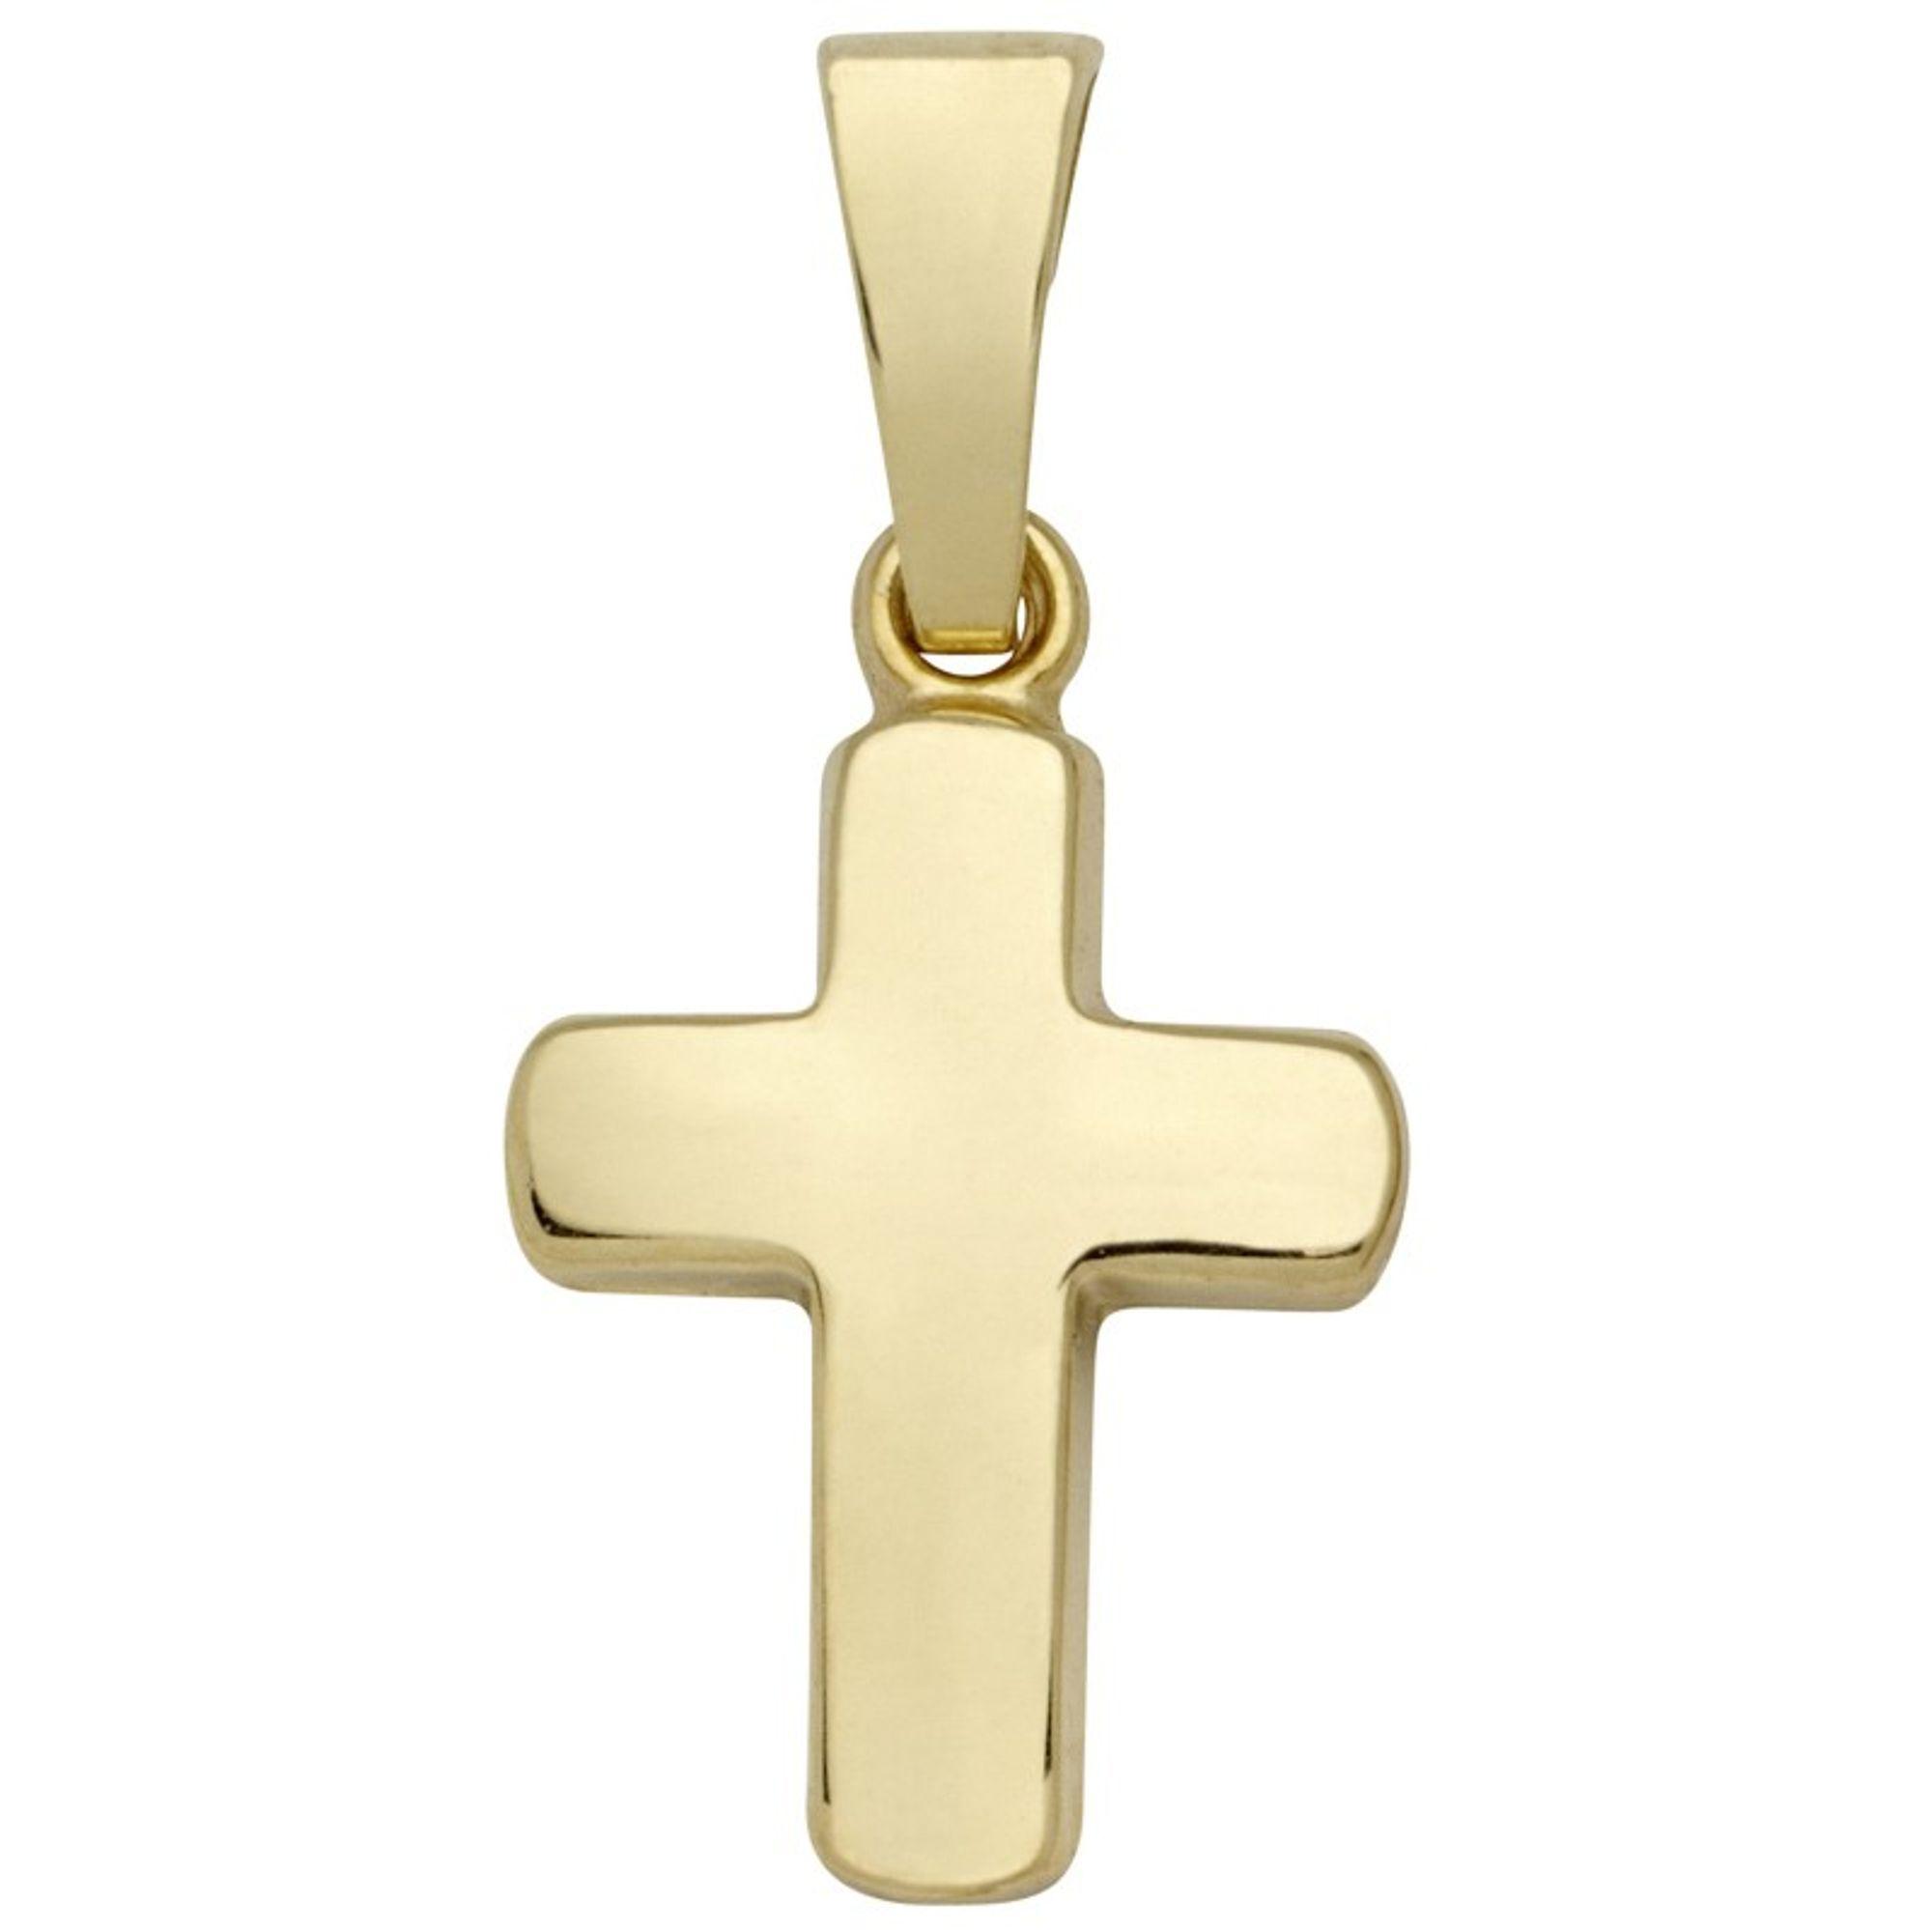 Basic Gold K28 Kinder Anhänger Kreuz 14 Karat (585) Gelbgold